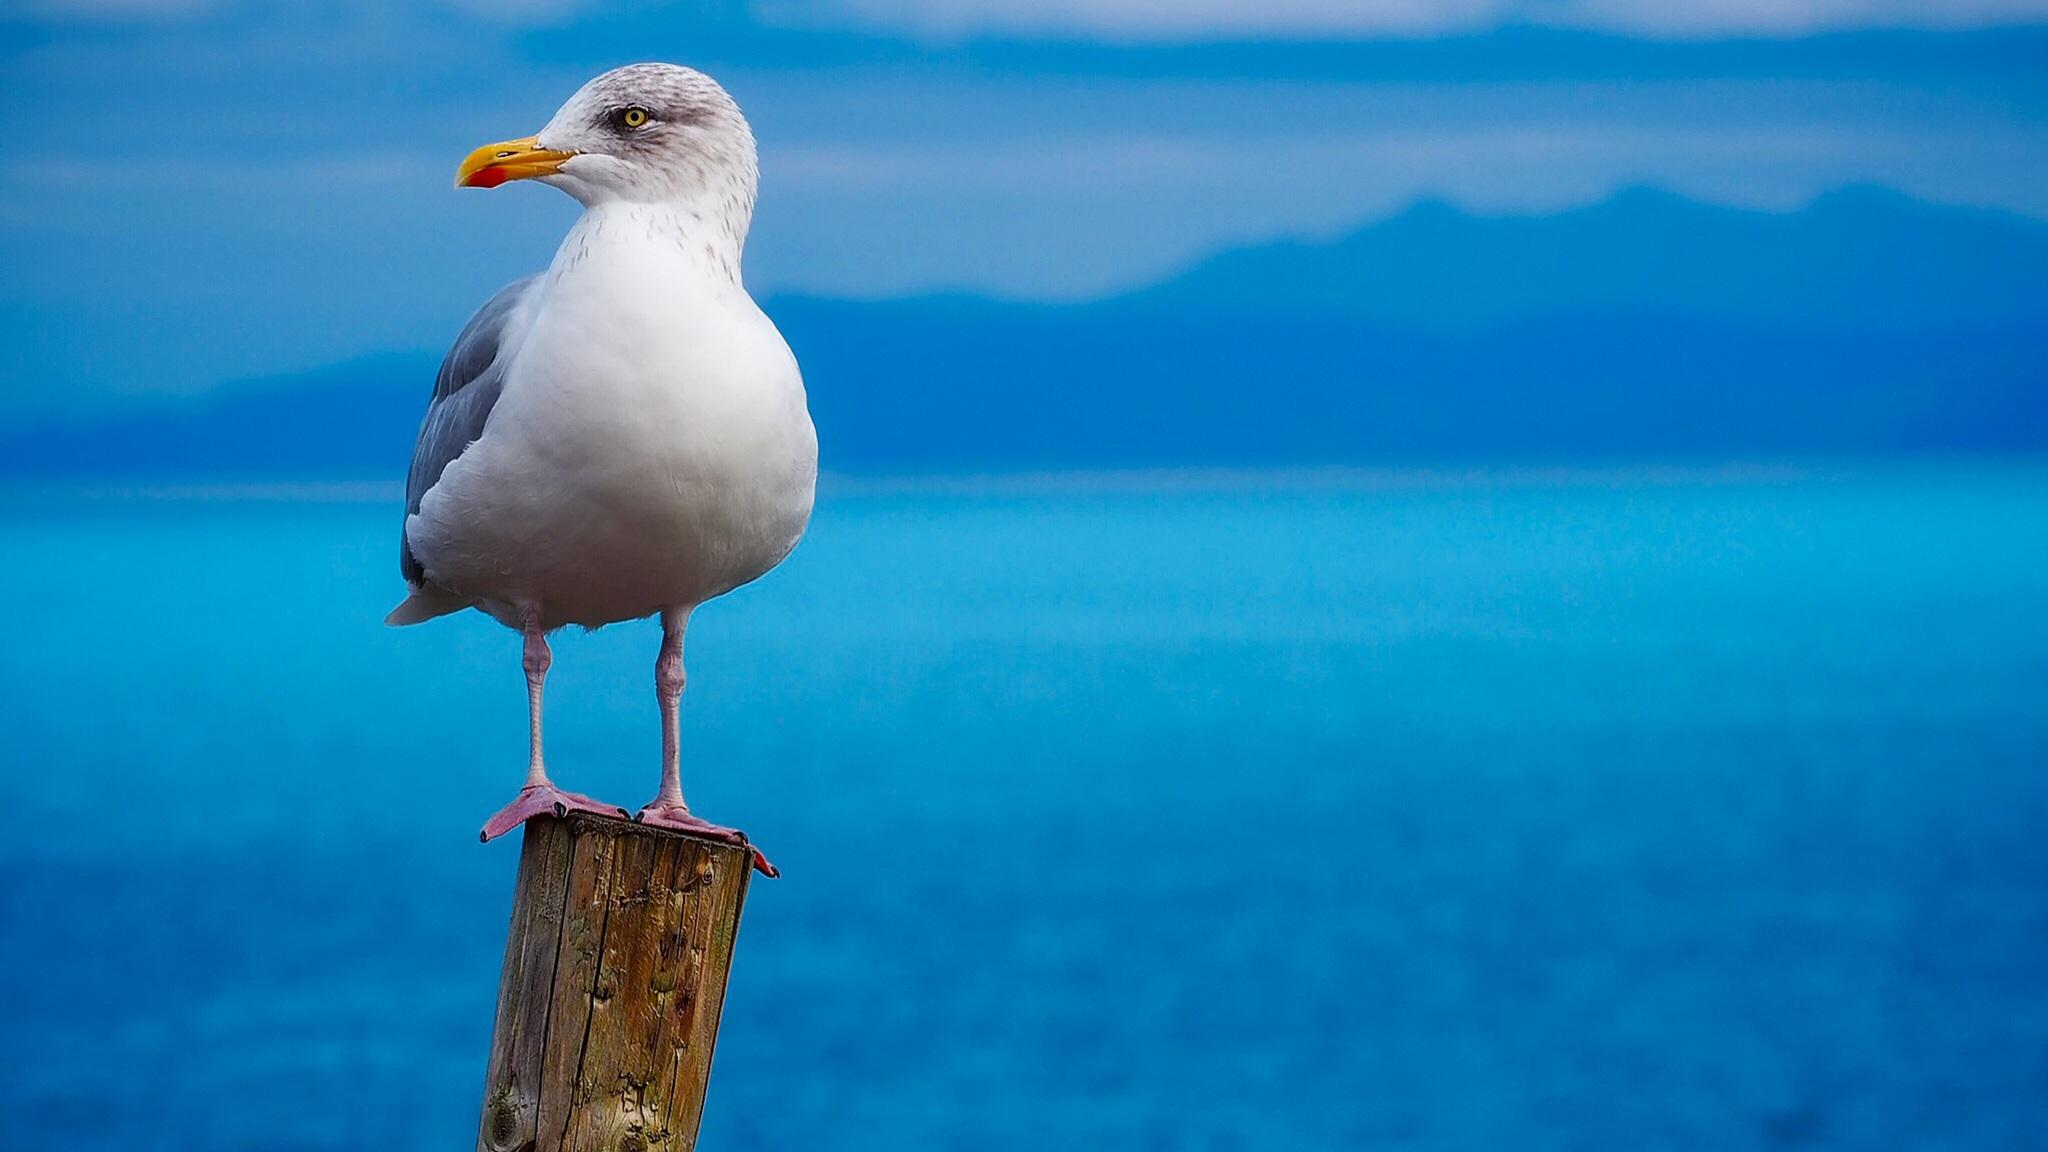 2048x1152 seagull birds hd 2048x1152 resolution hd 4k wallpapers